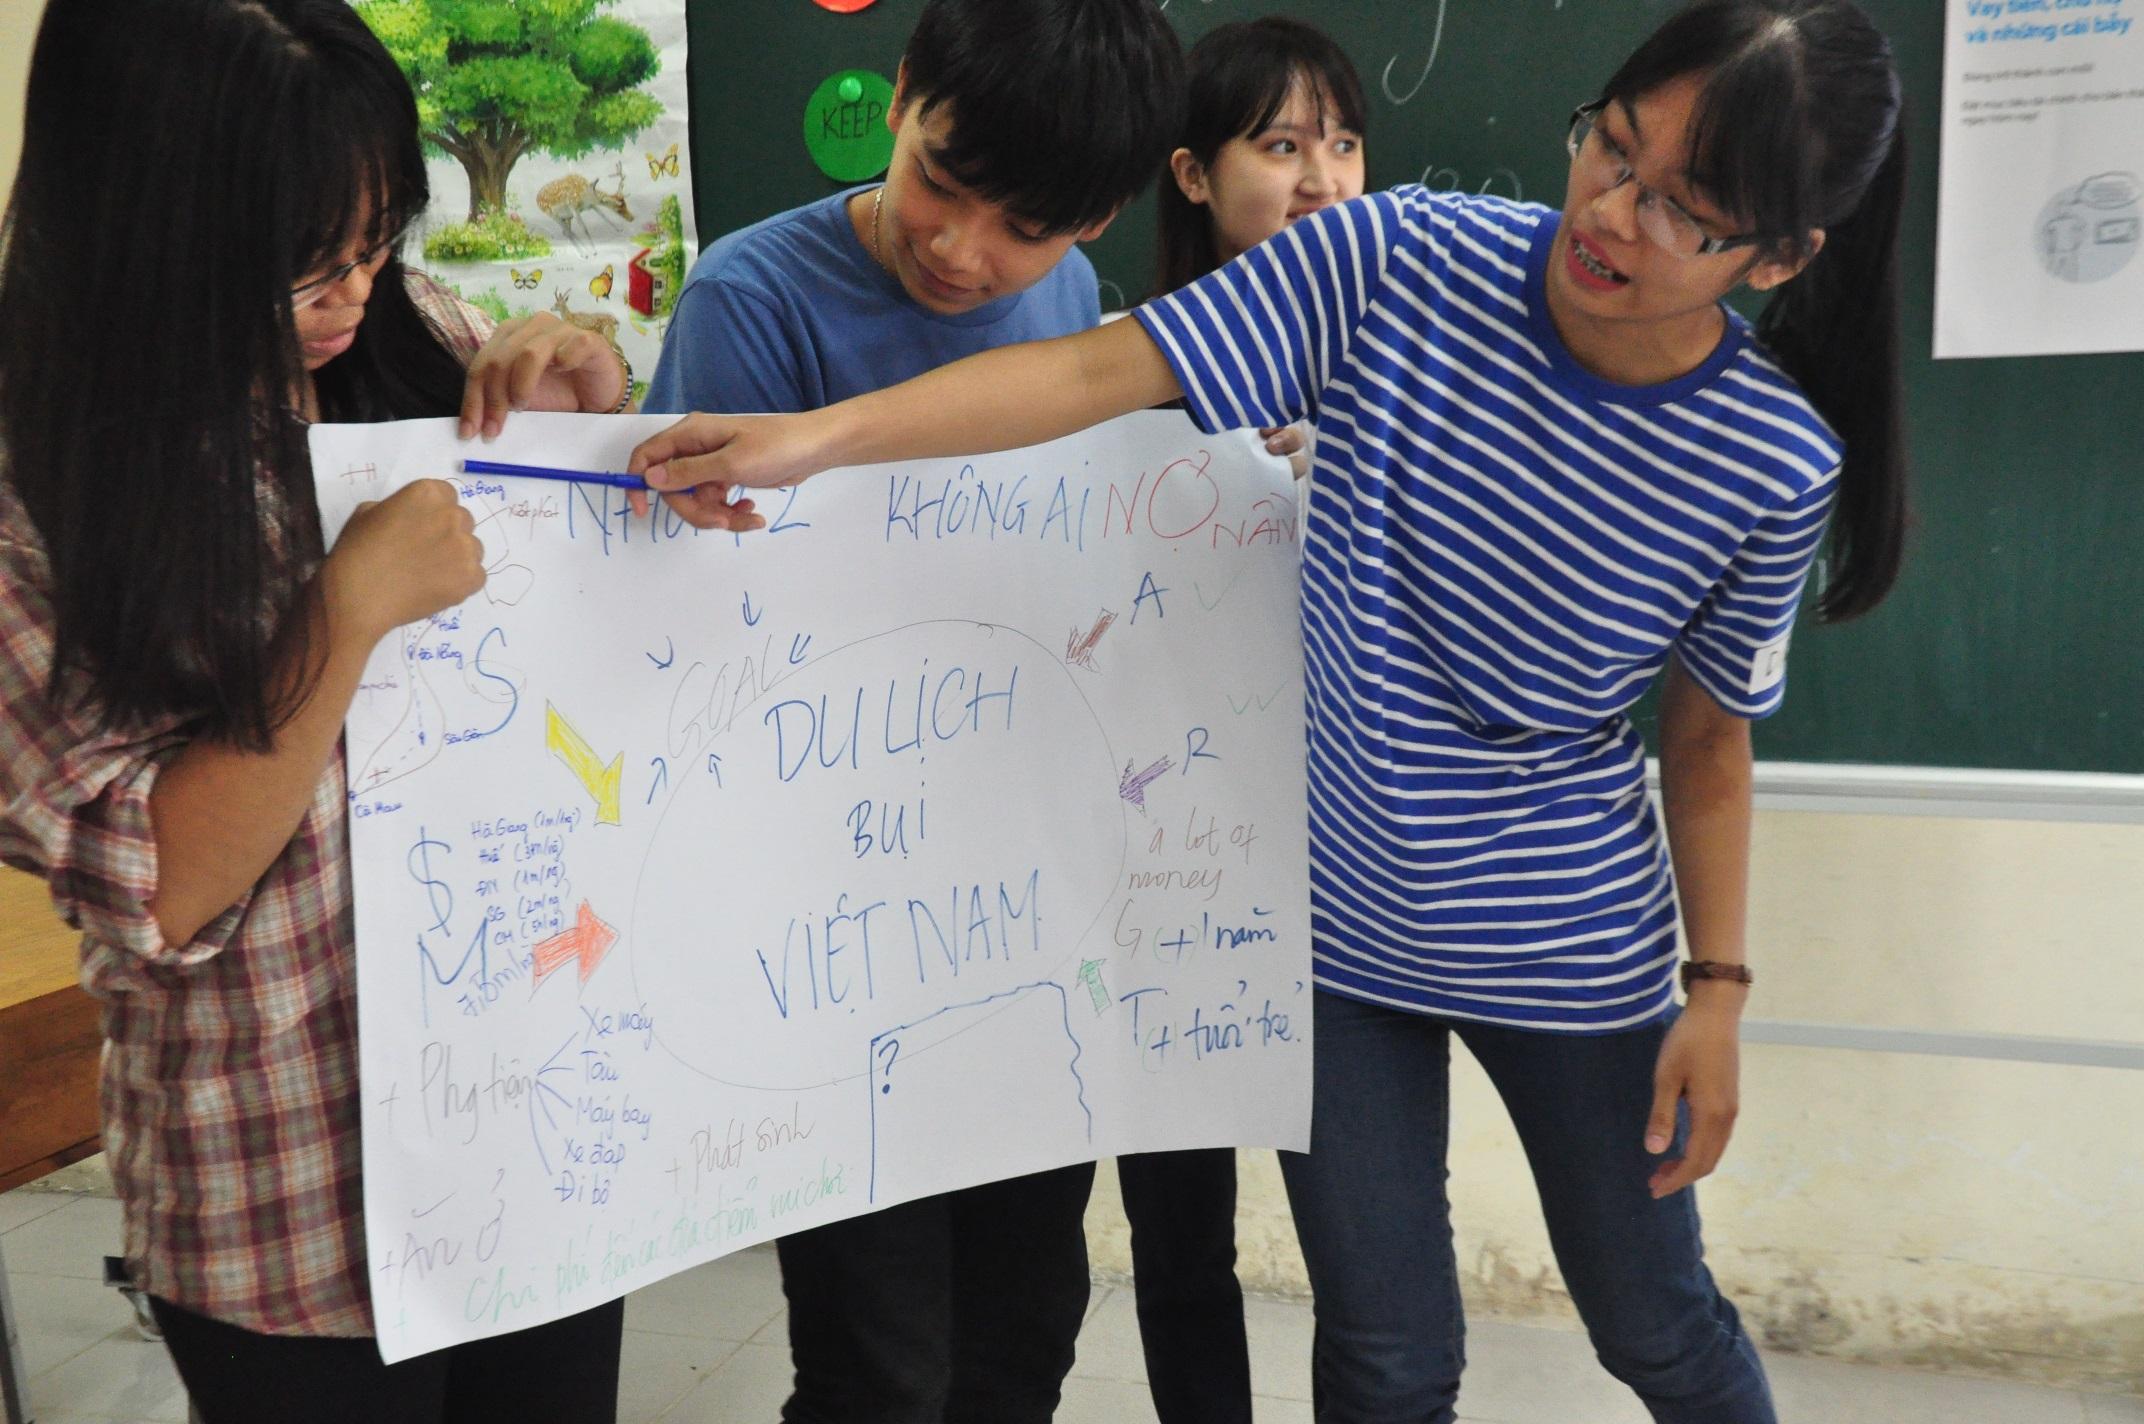 anzs moneyminded programme promotes money management skills in vietnam